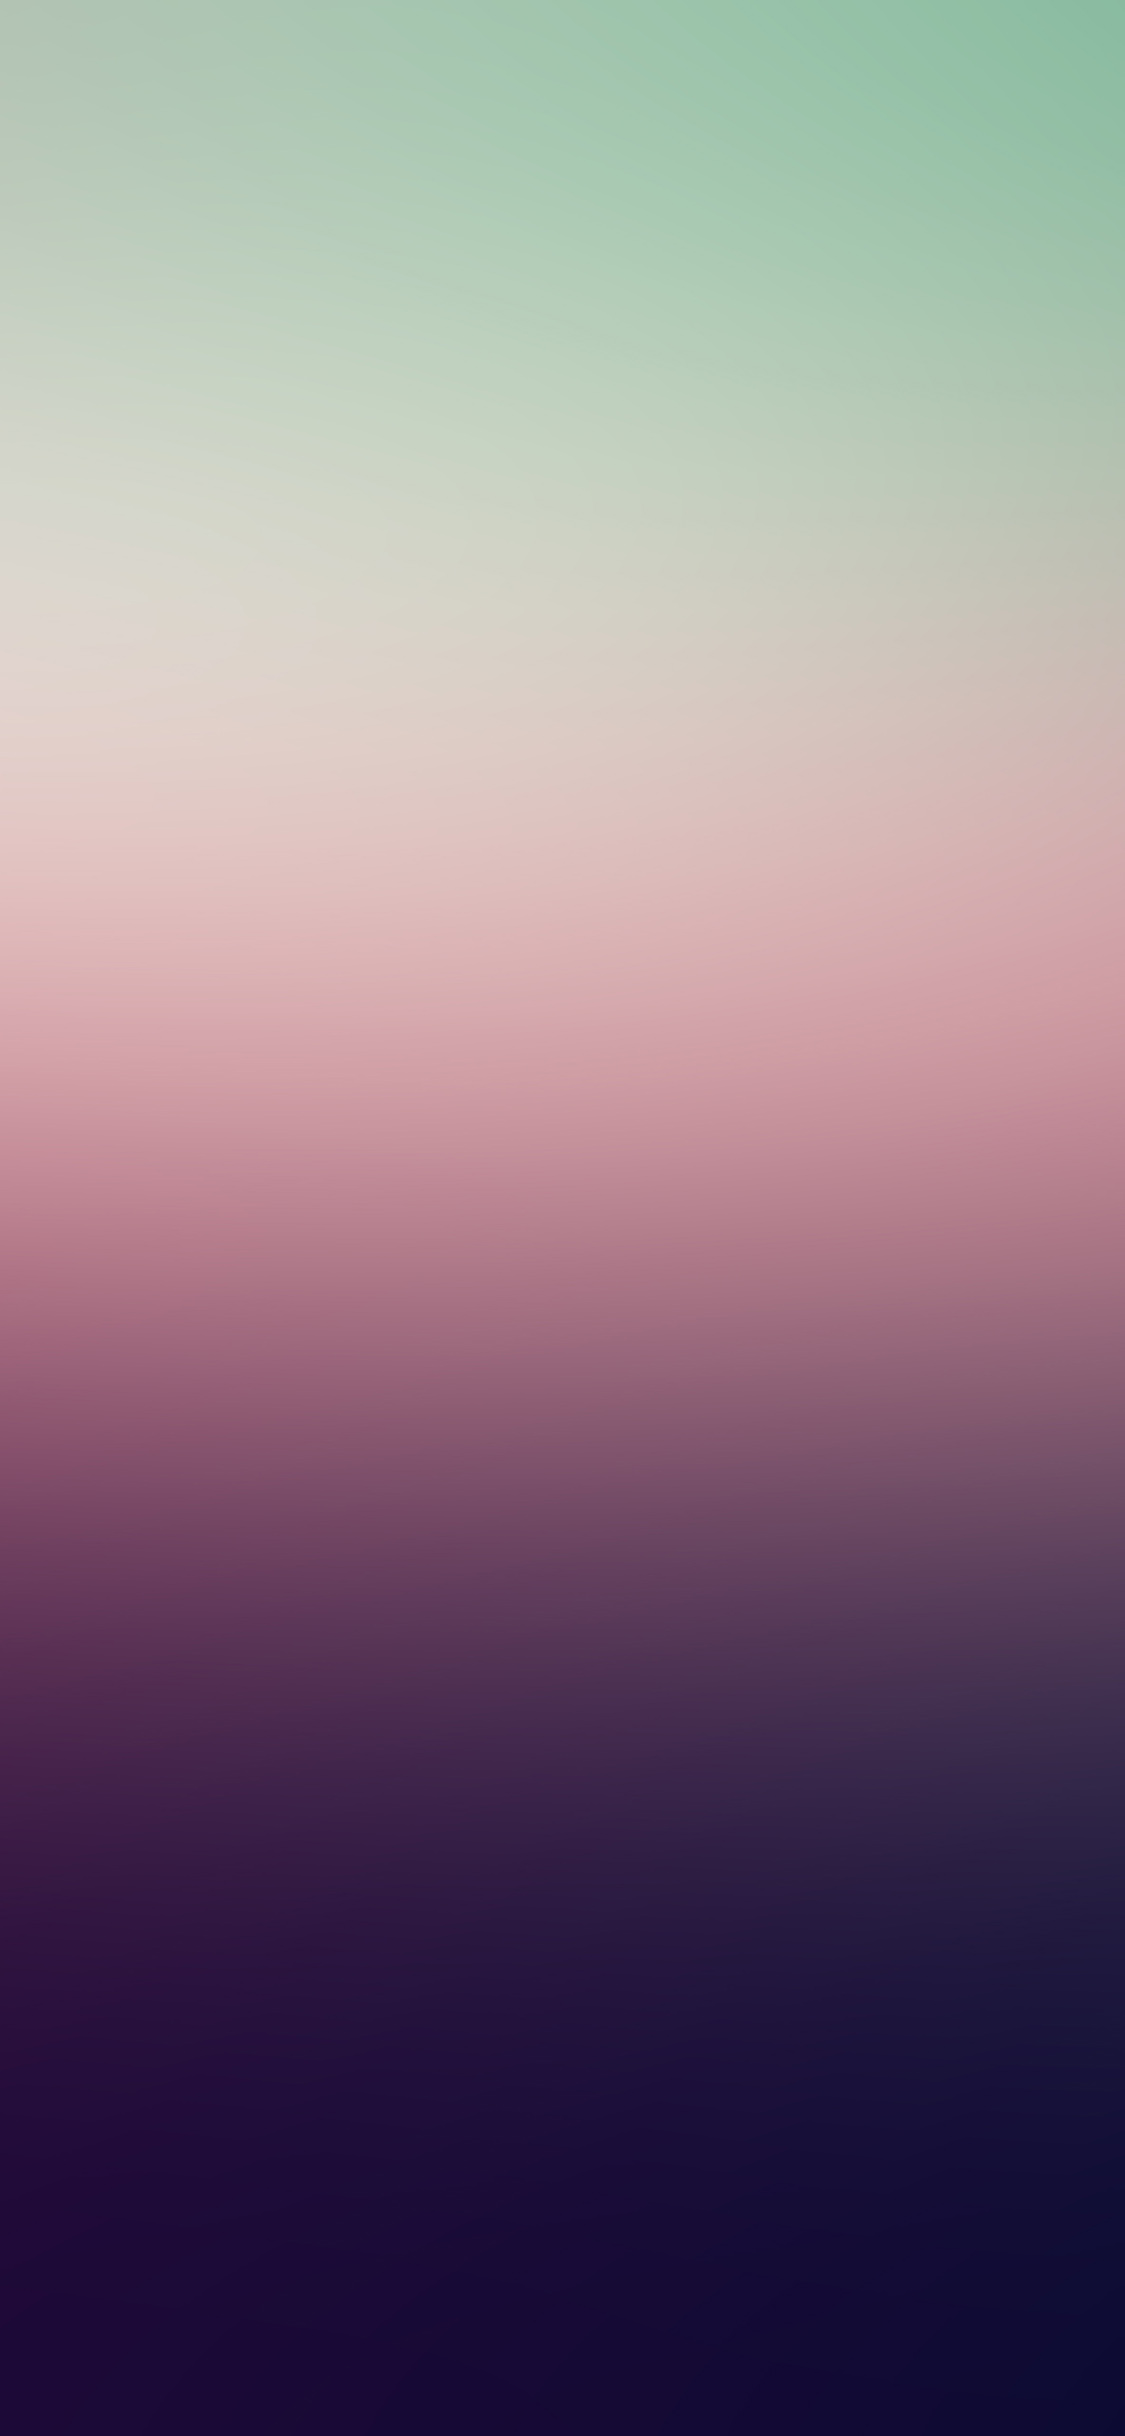 Iphone - Color gradation wallpaper ...